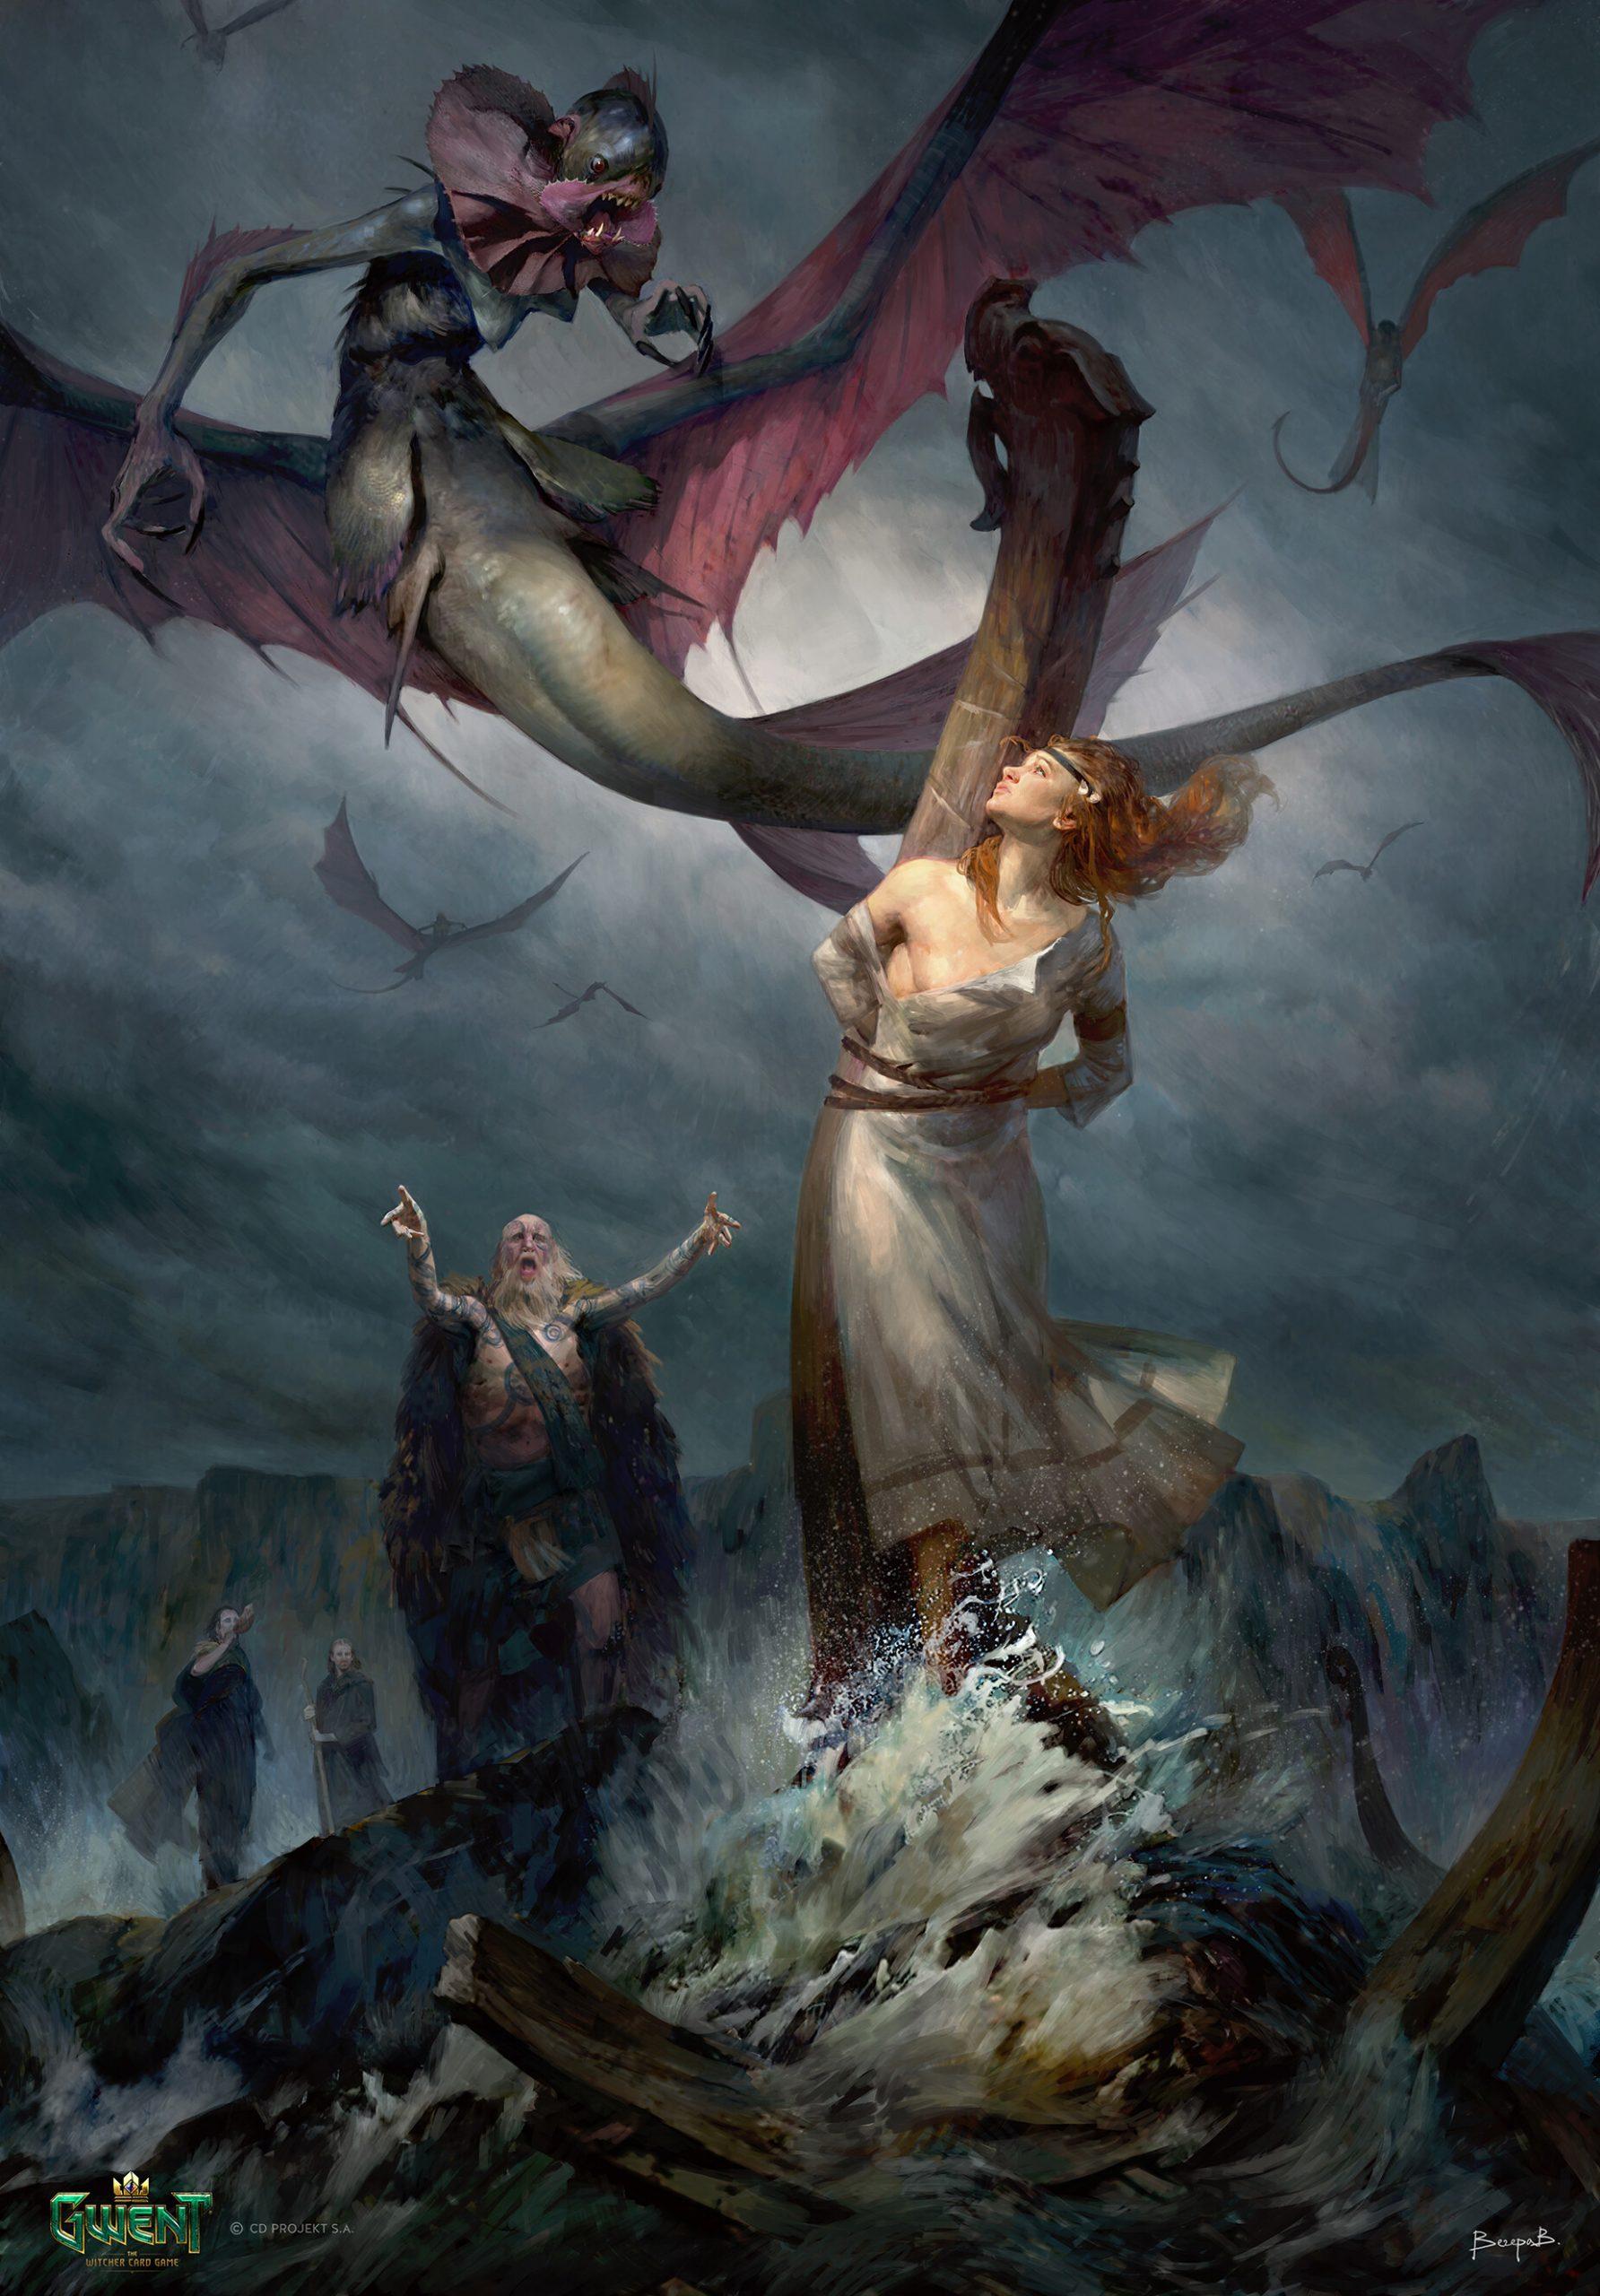 The Glorious Fantasy Artworks of Valeriy Vegera